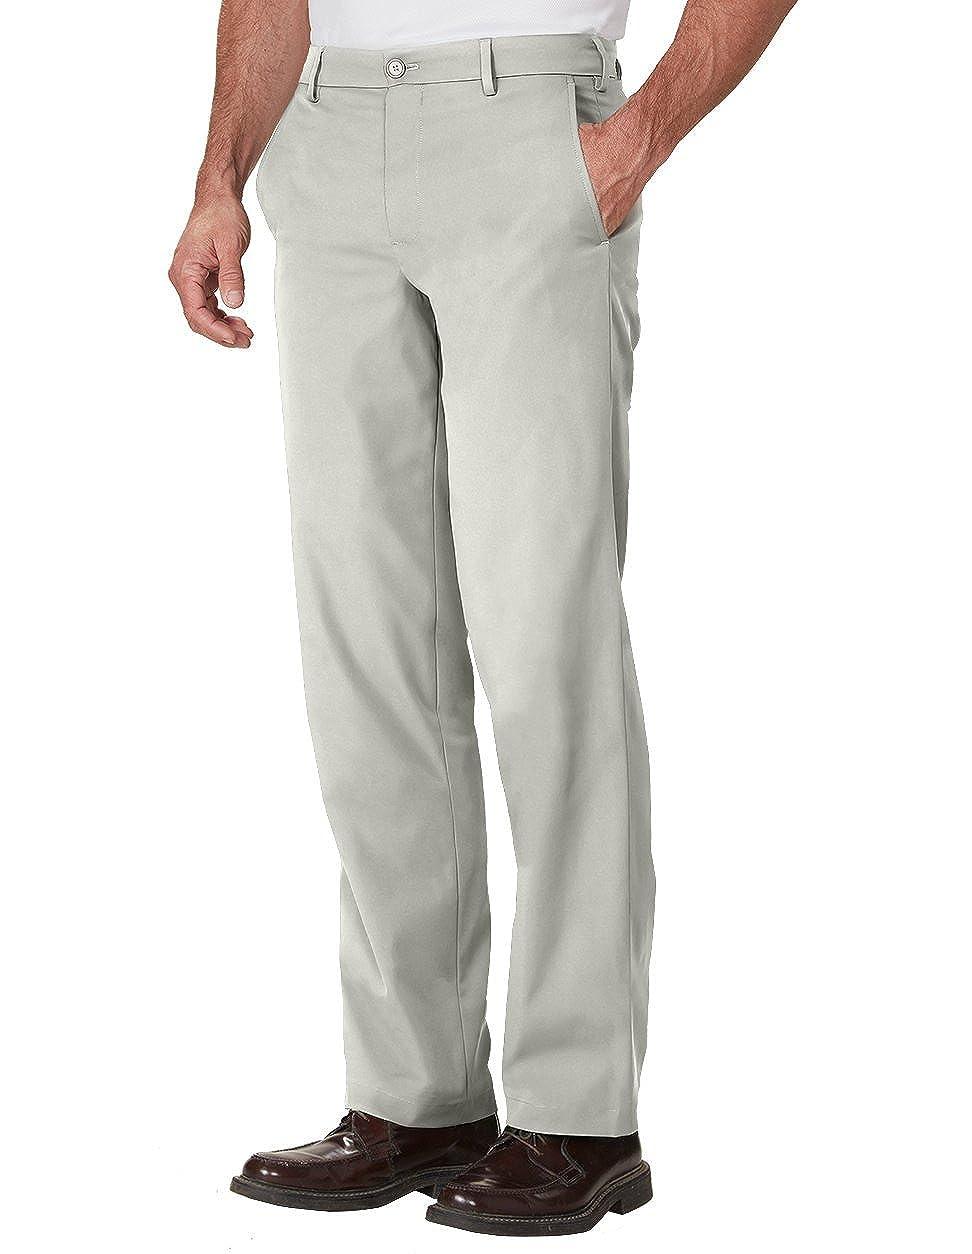 3459ecdc SCOTTeVEST Contemporary Cargo Pants - 6 Pockets Business Mens Travel Pants